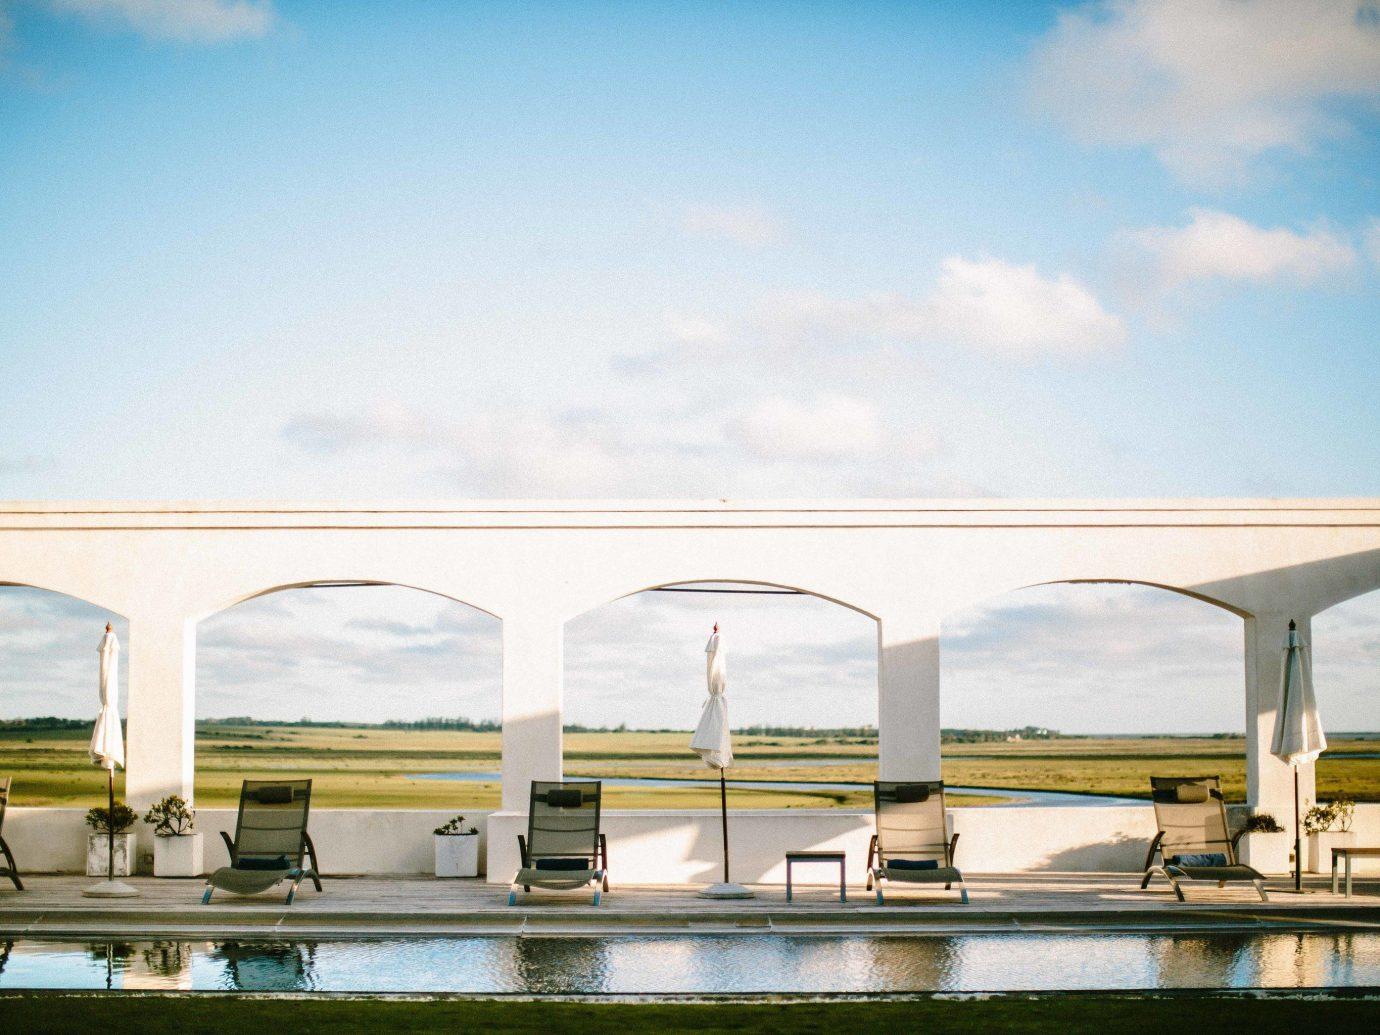 Beach Romantic Getaways south america Trip Ideas Uruguay bridge sky water fixed link reflection cloud